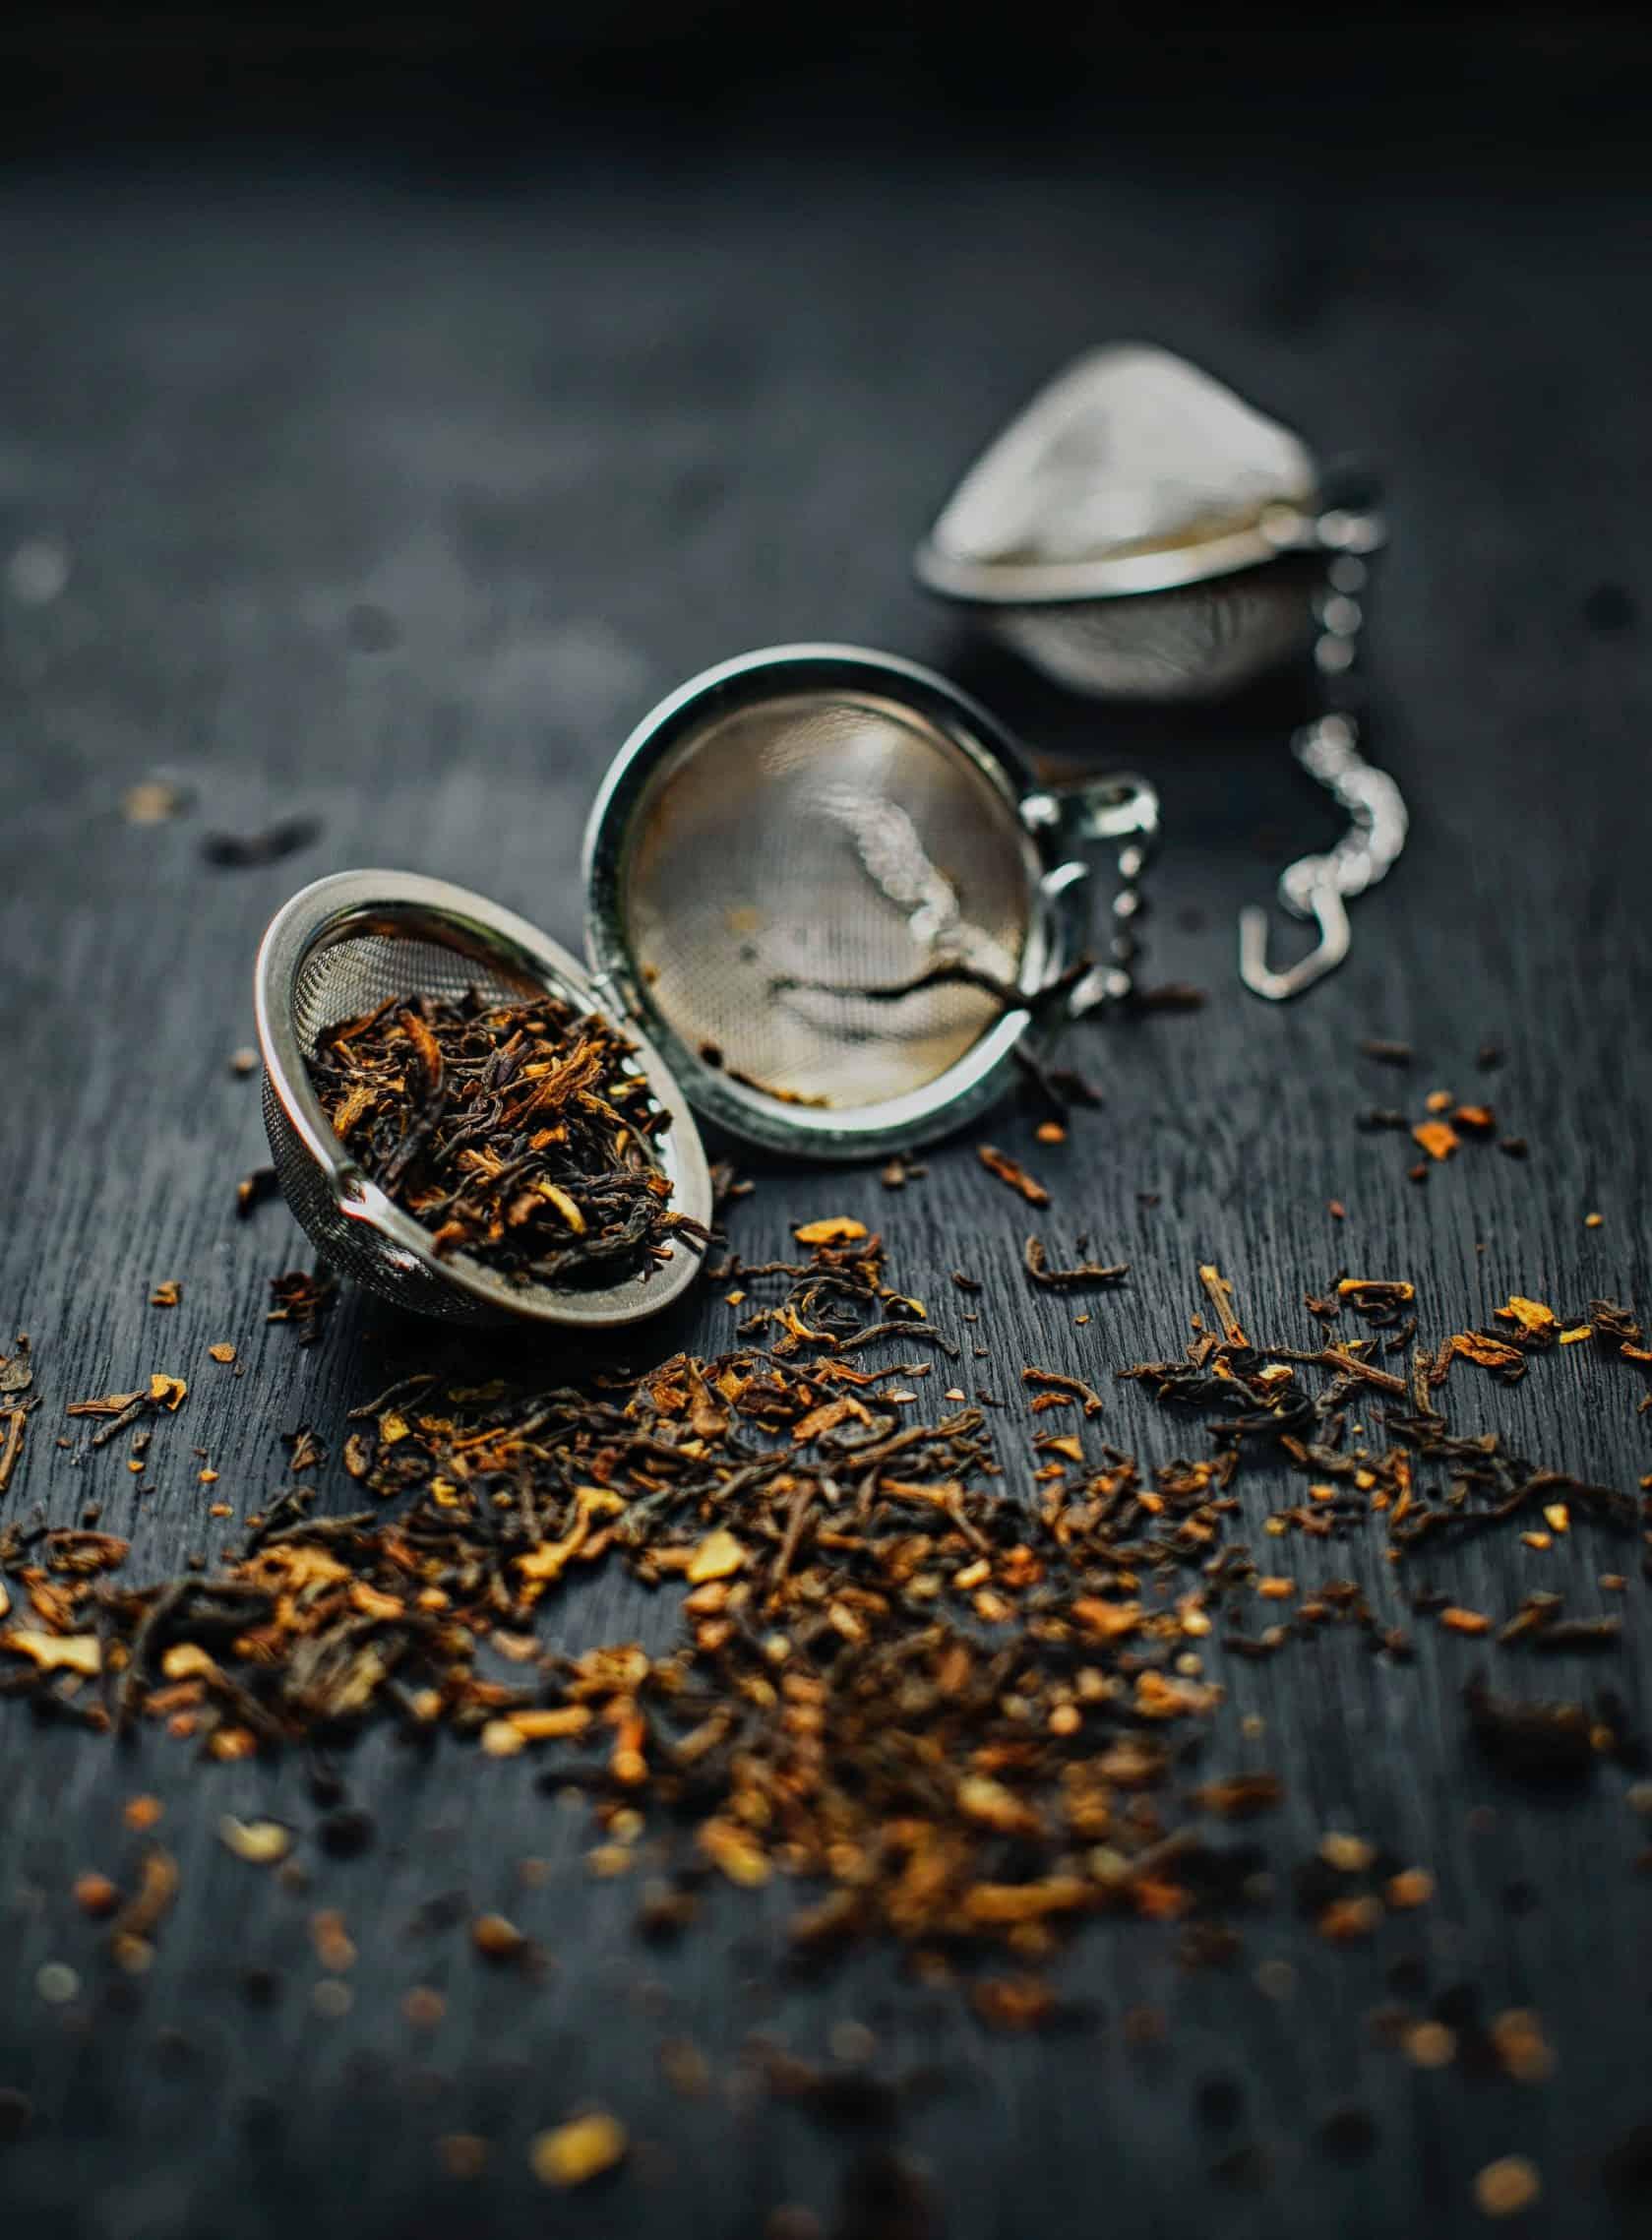 spilled tea on surface